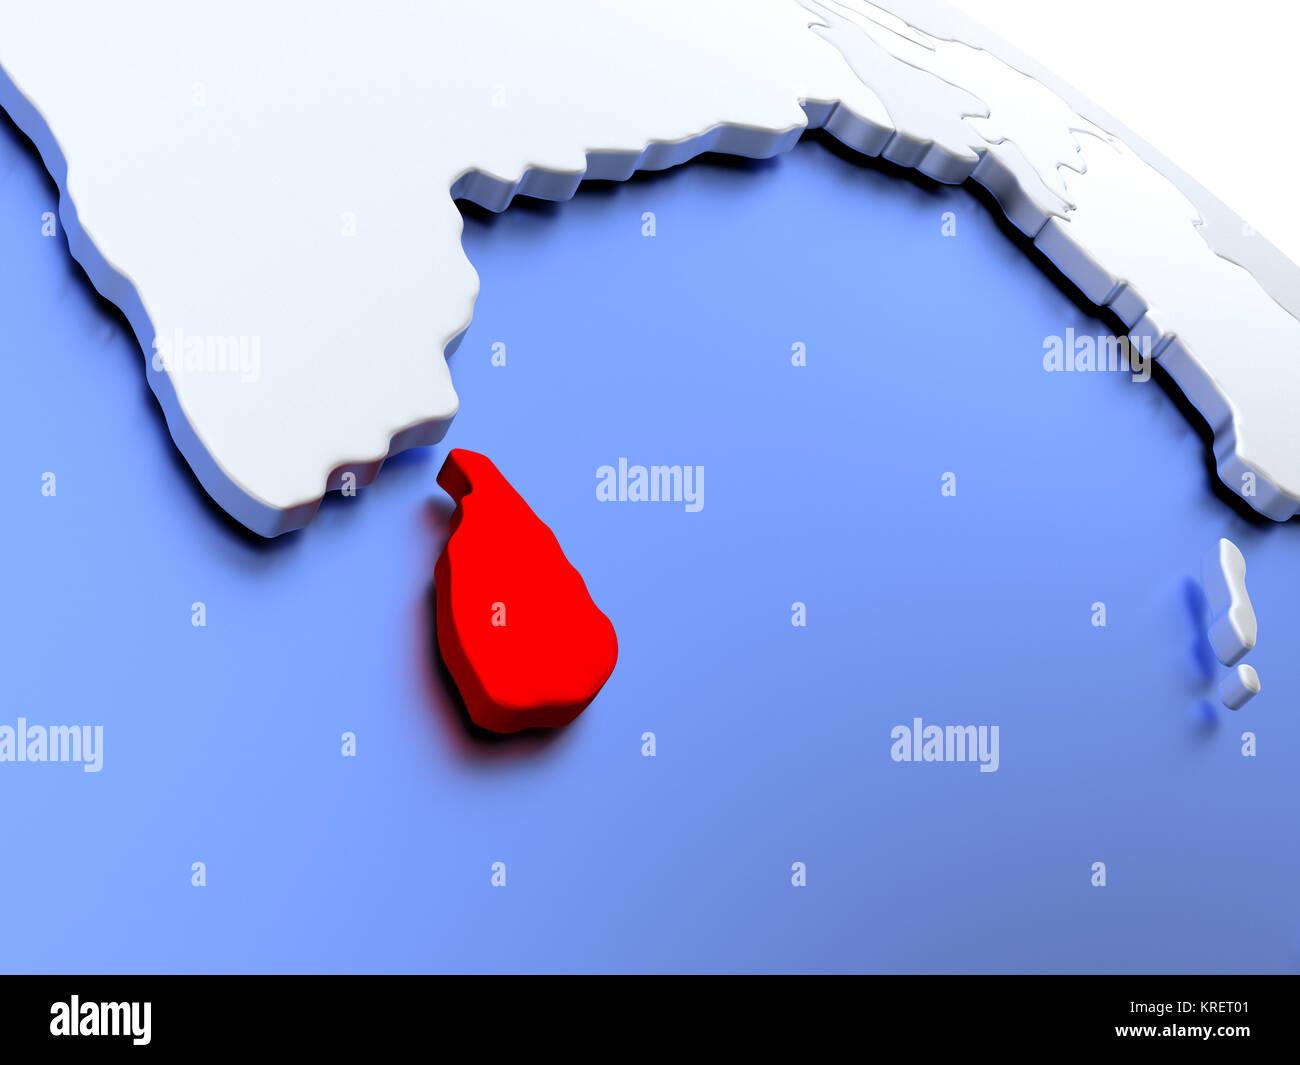 Sri Lanka on world map Stock Photo: 169356545 - Alamy